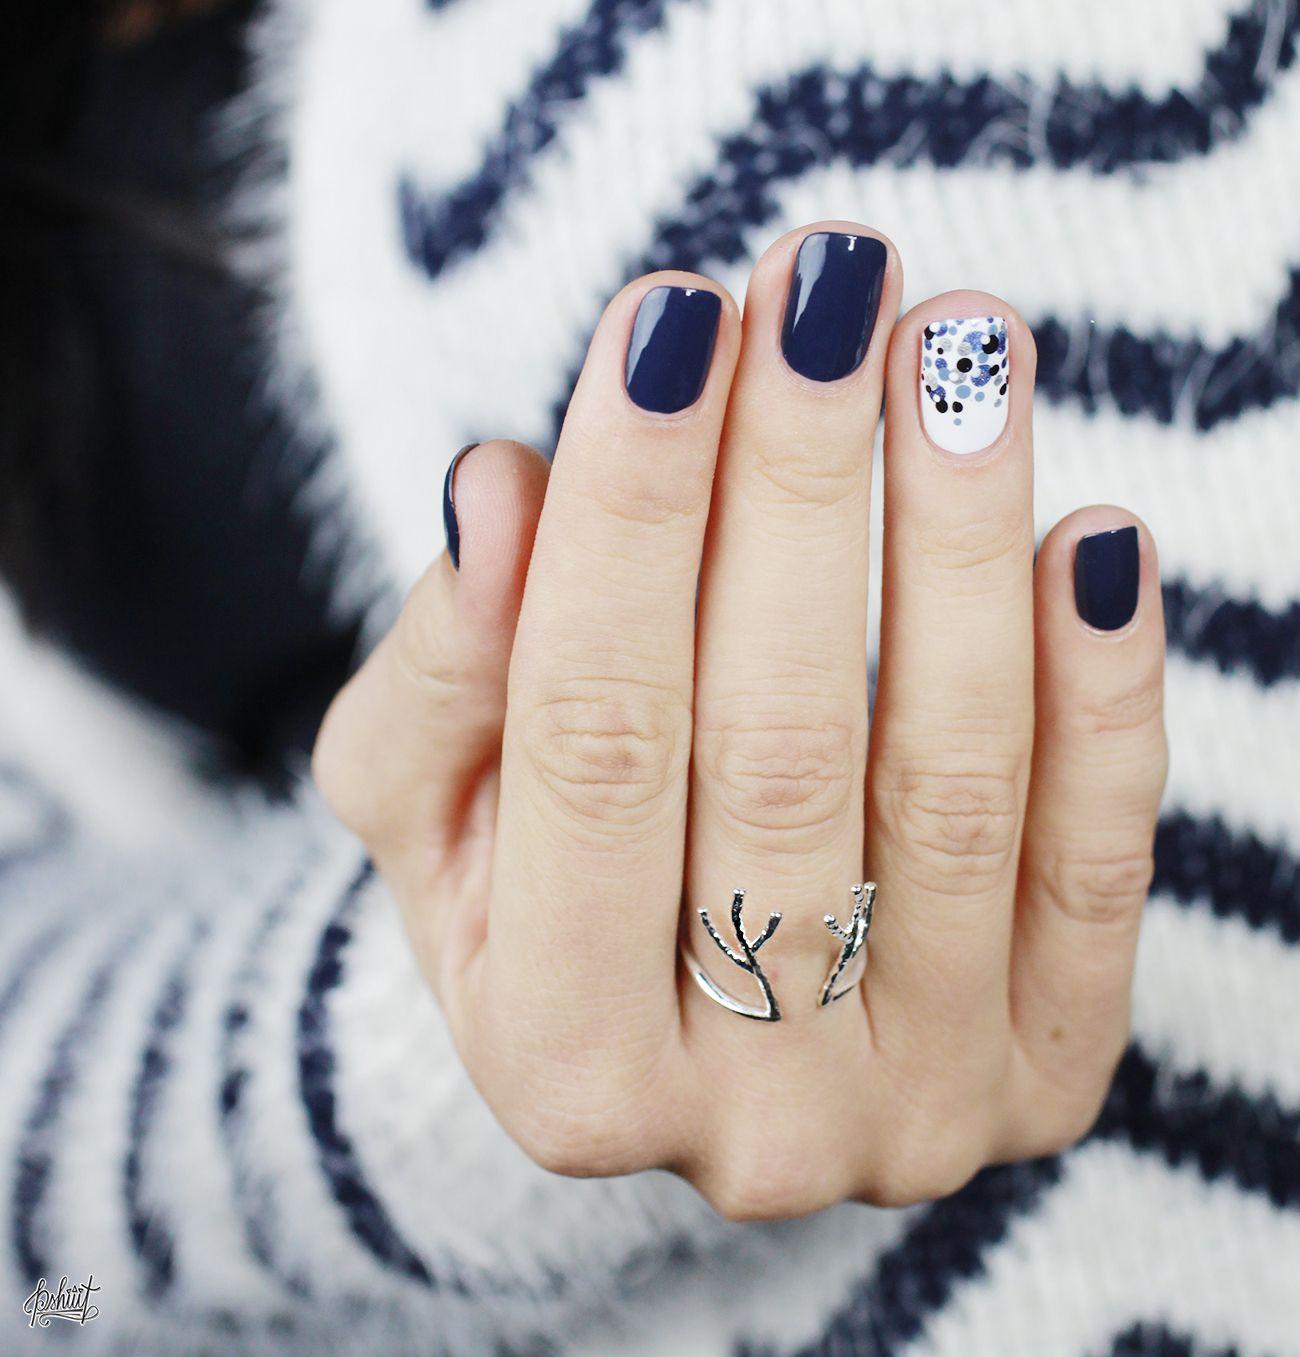 Dior Carré Bleu Selection de vernis automne 2014   Ongles ...